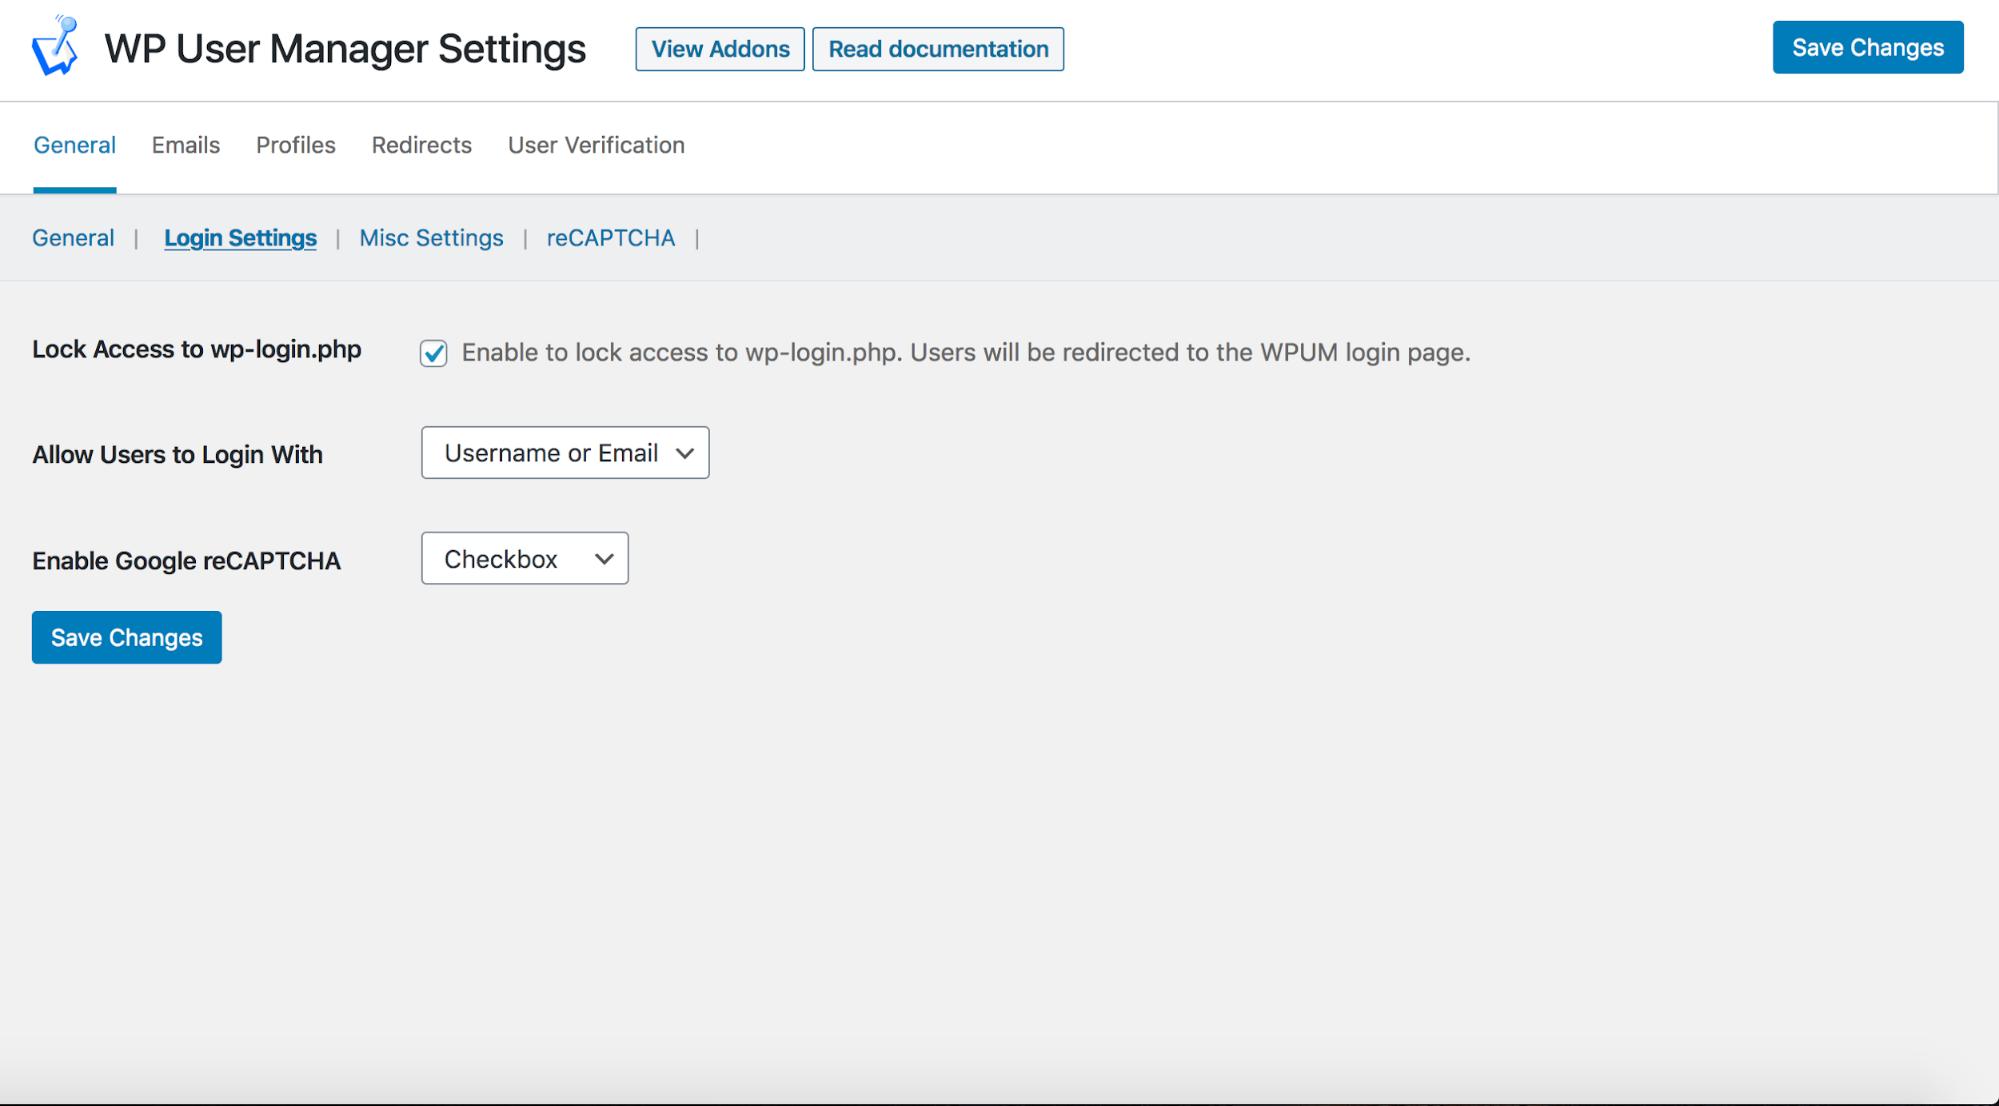 WP User Manager General login Settings 2